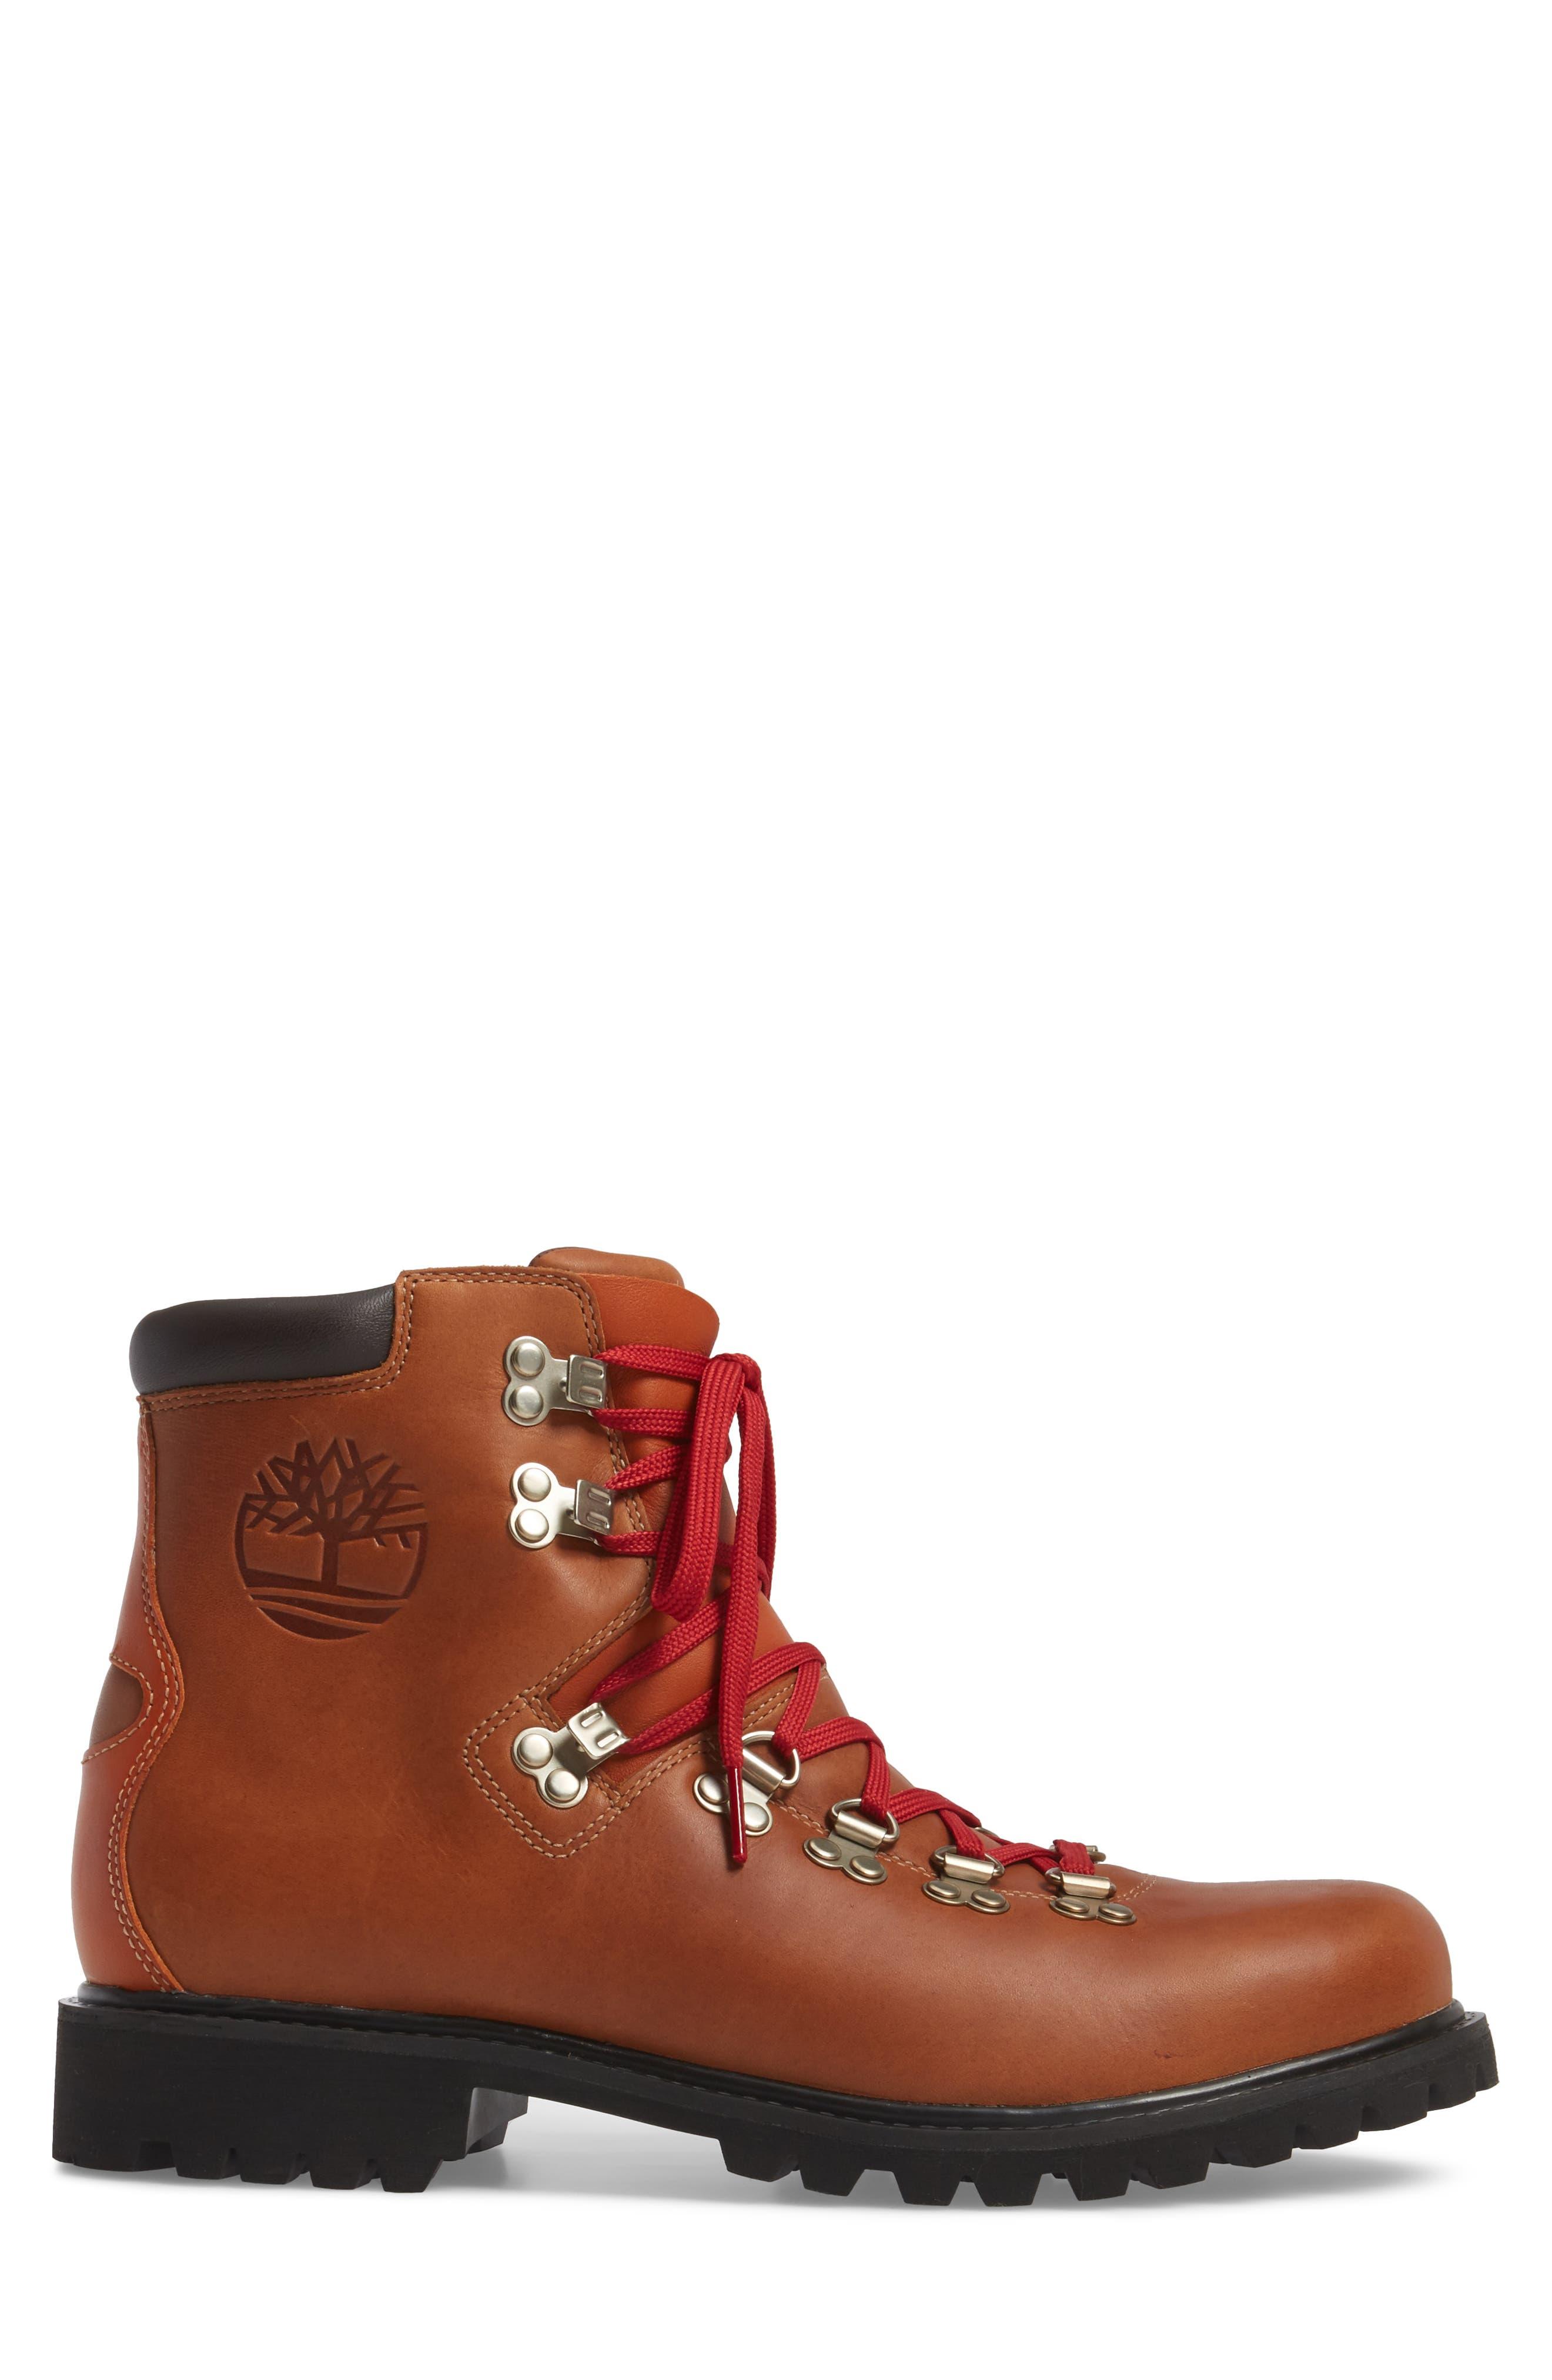 1978 Waterproof Boot,                             Alternate thumbnail 3, color,                             Claypot